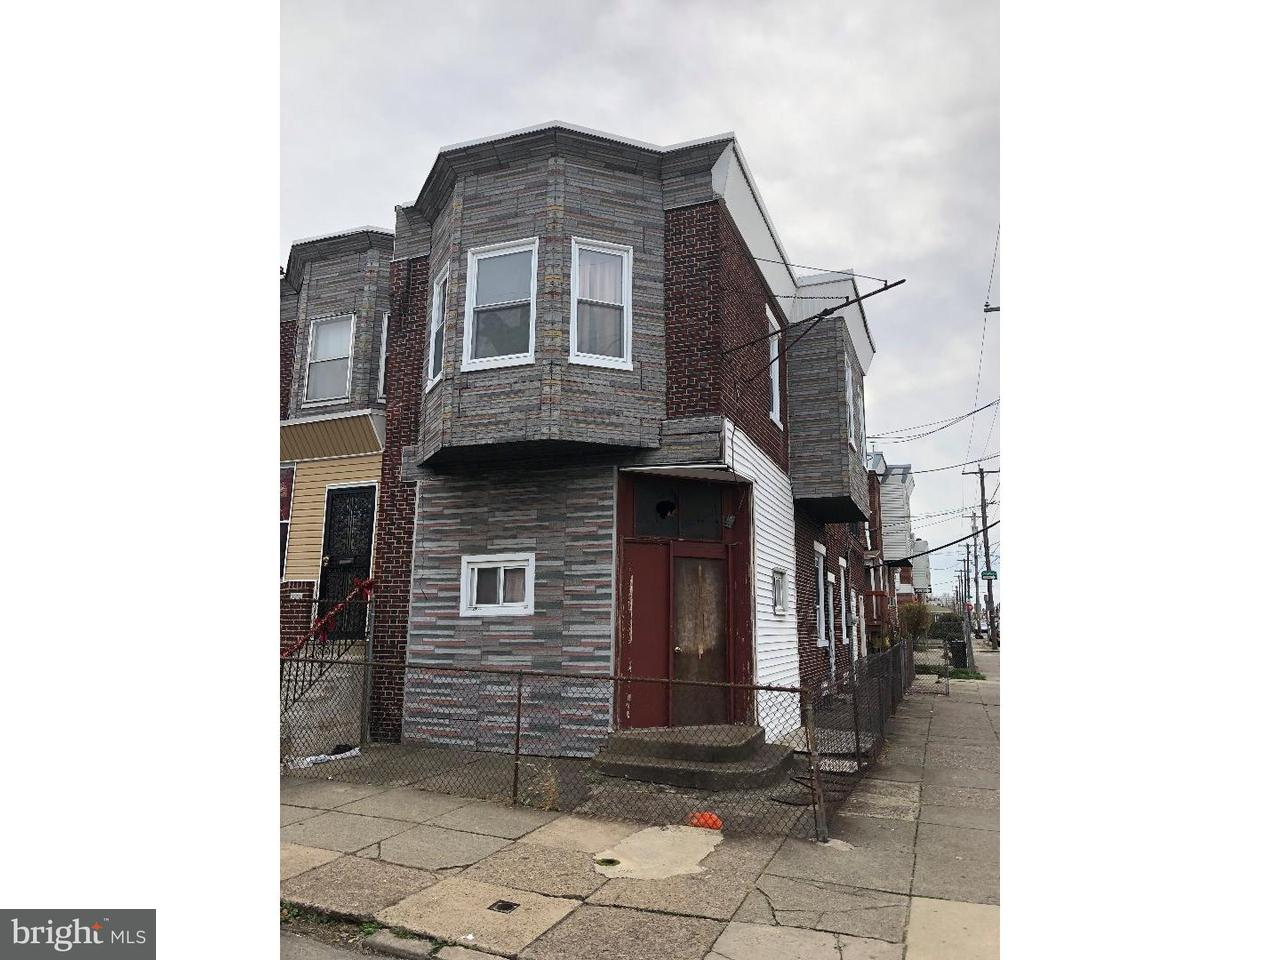 1700 S Yewdall Philadelphia, PA 19143